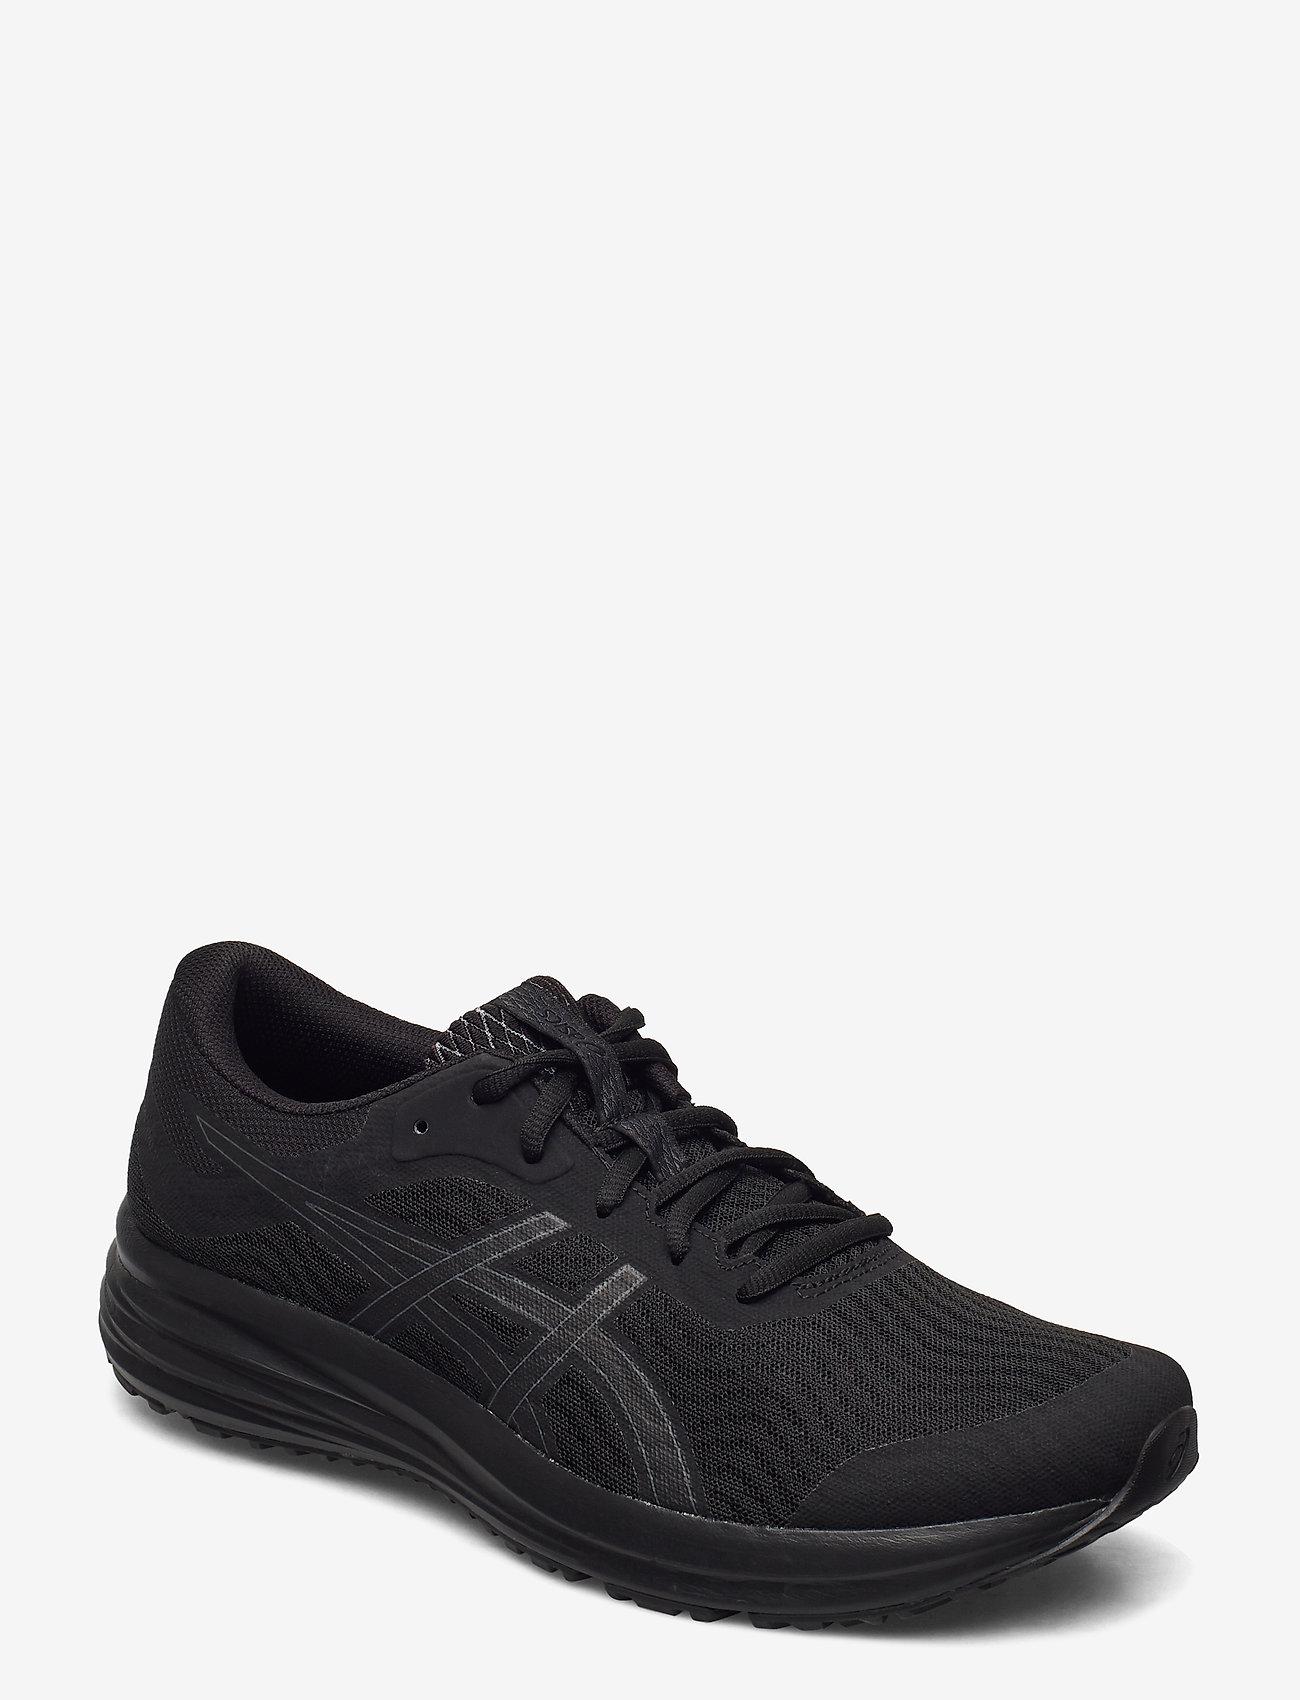 Asics - PATRIOT 12 - löbesko - black/black - 0